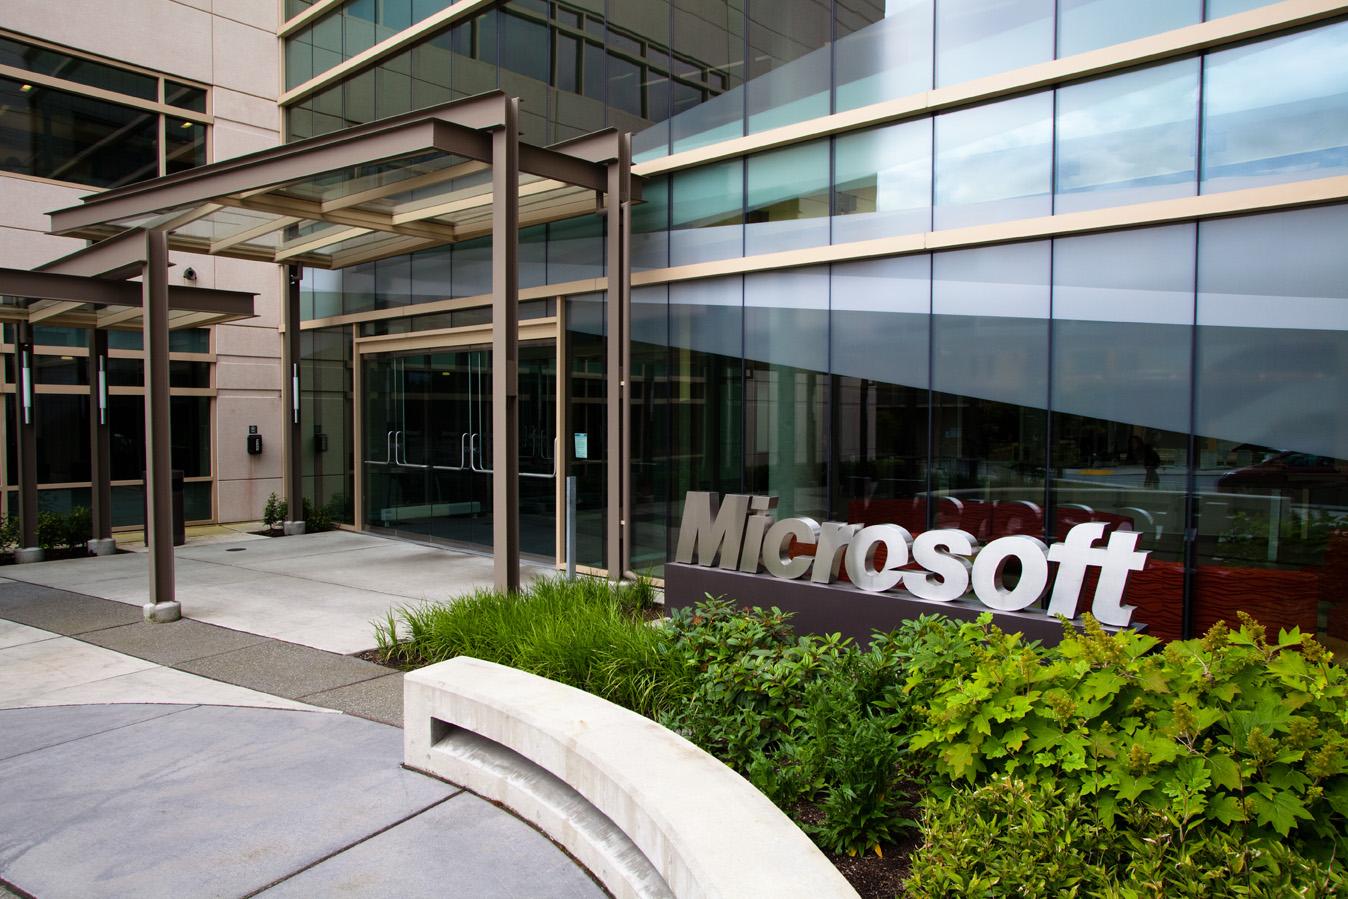 Microsoft office building entrance.